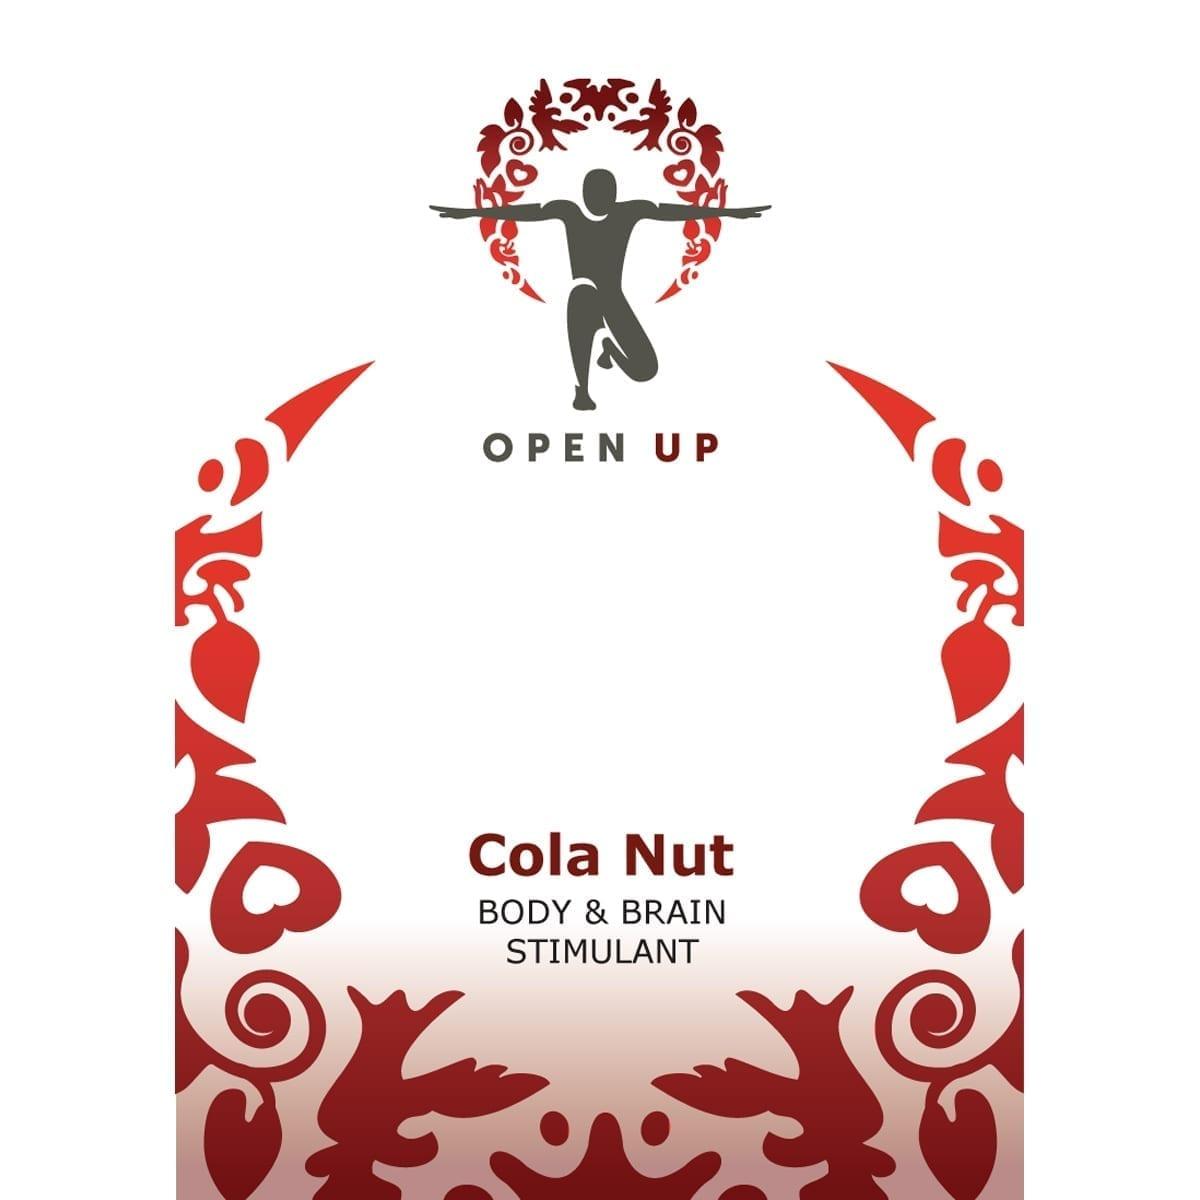 Colanut